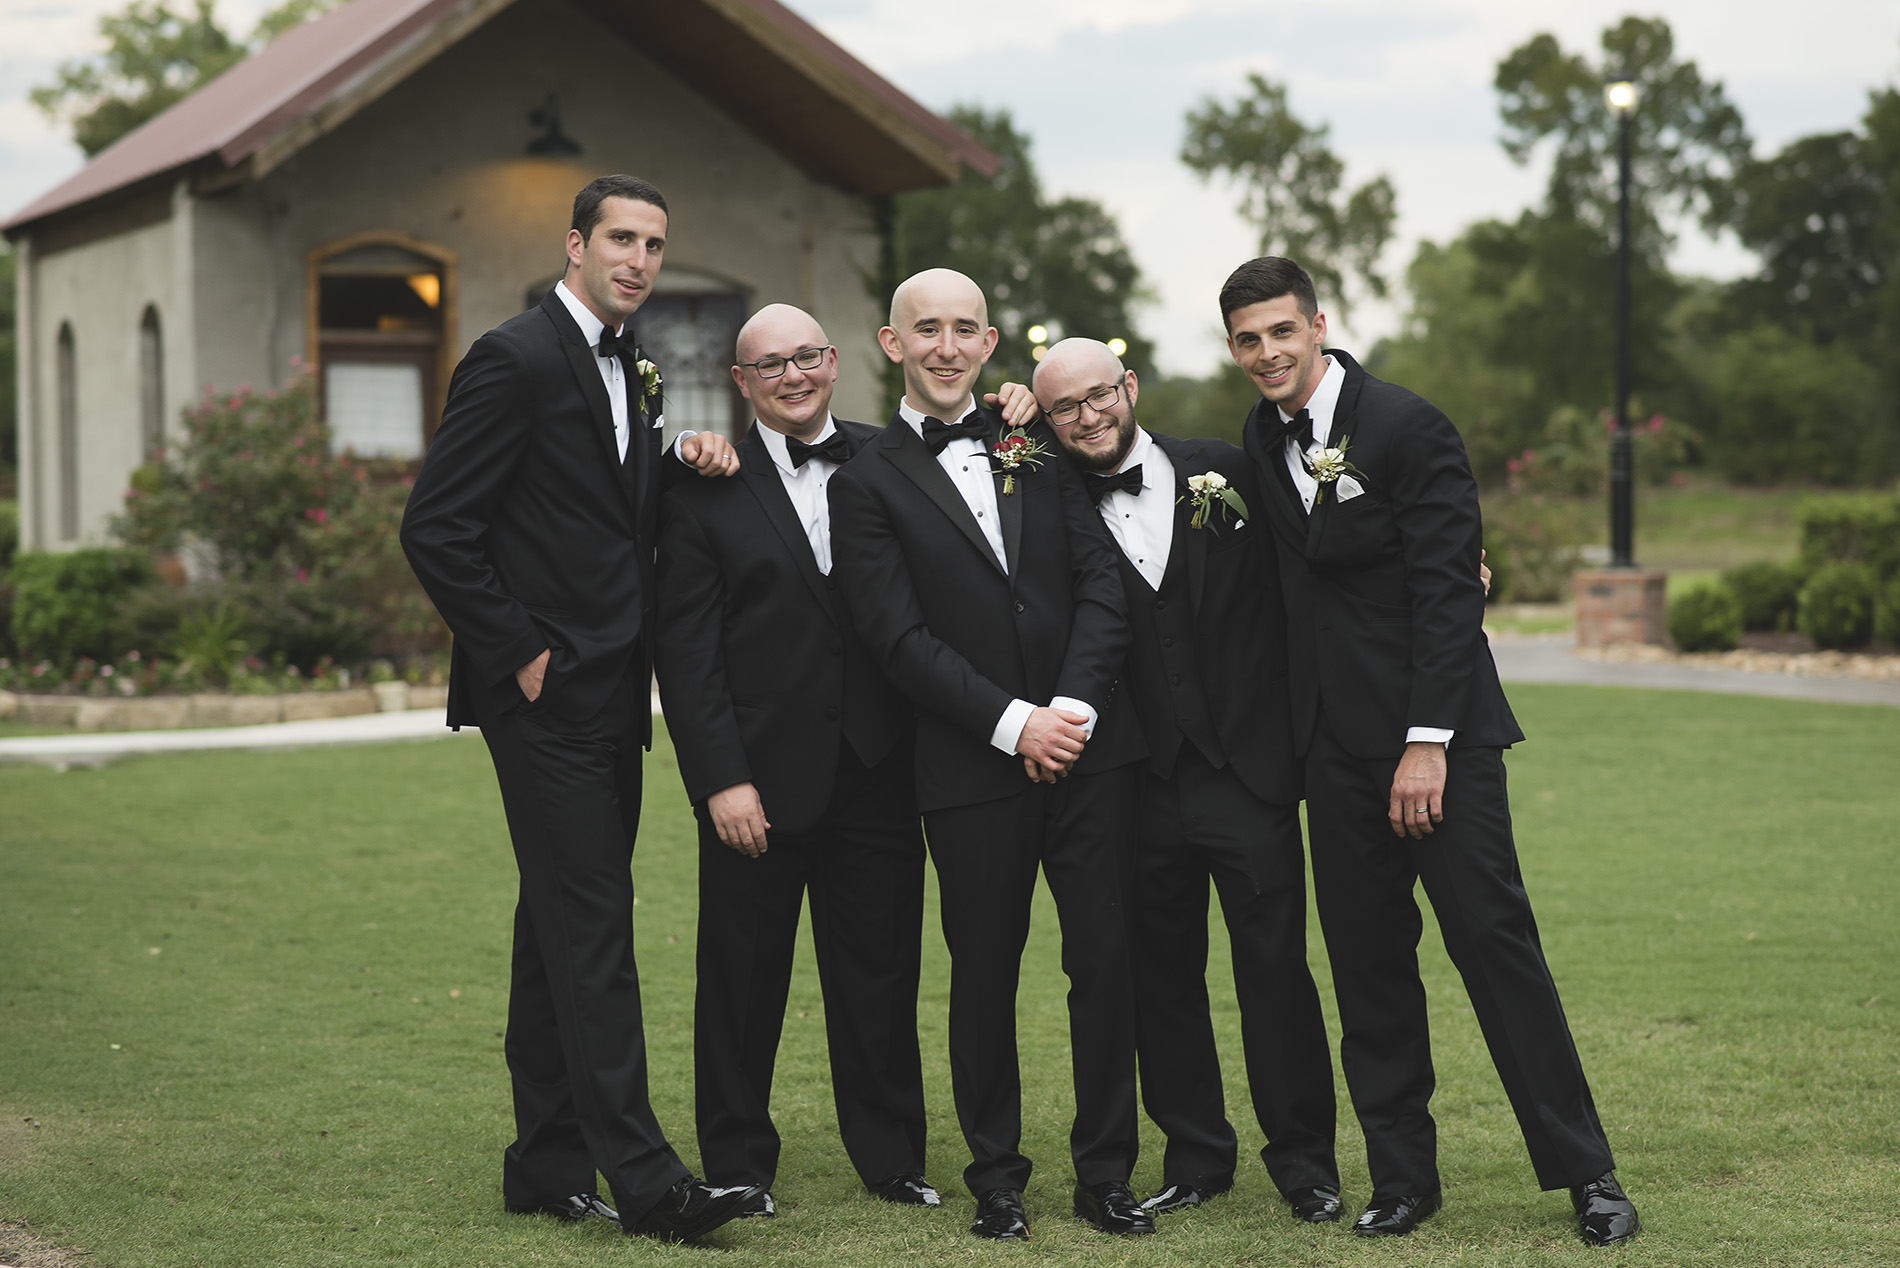 Houston-venue-Olde-Dobbin-Station-Romantic-Classic-Wedding-Photographer-083.jpg